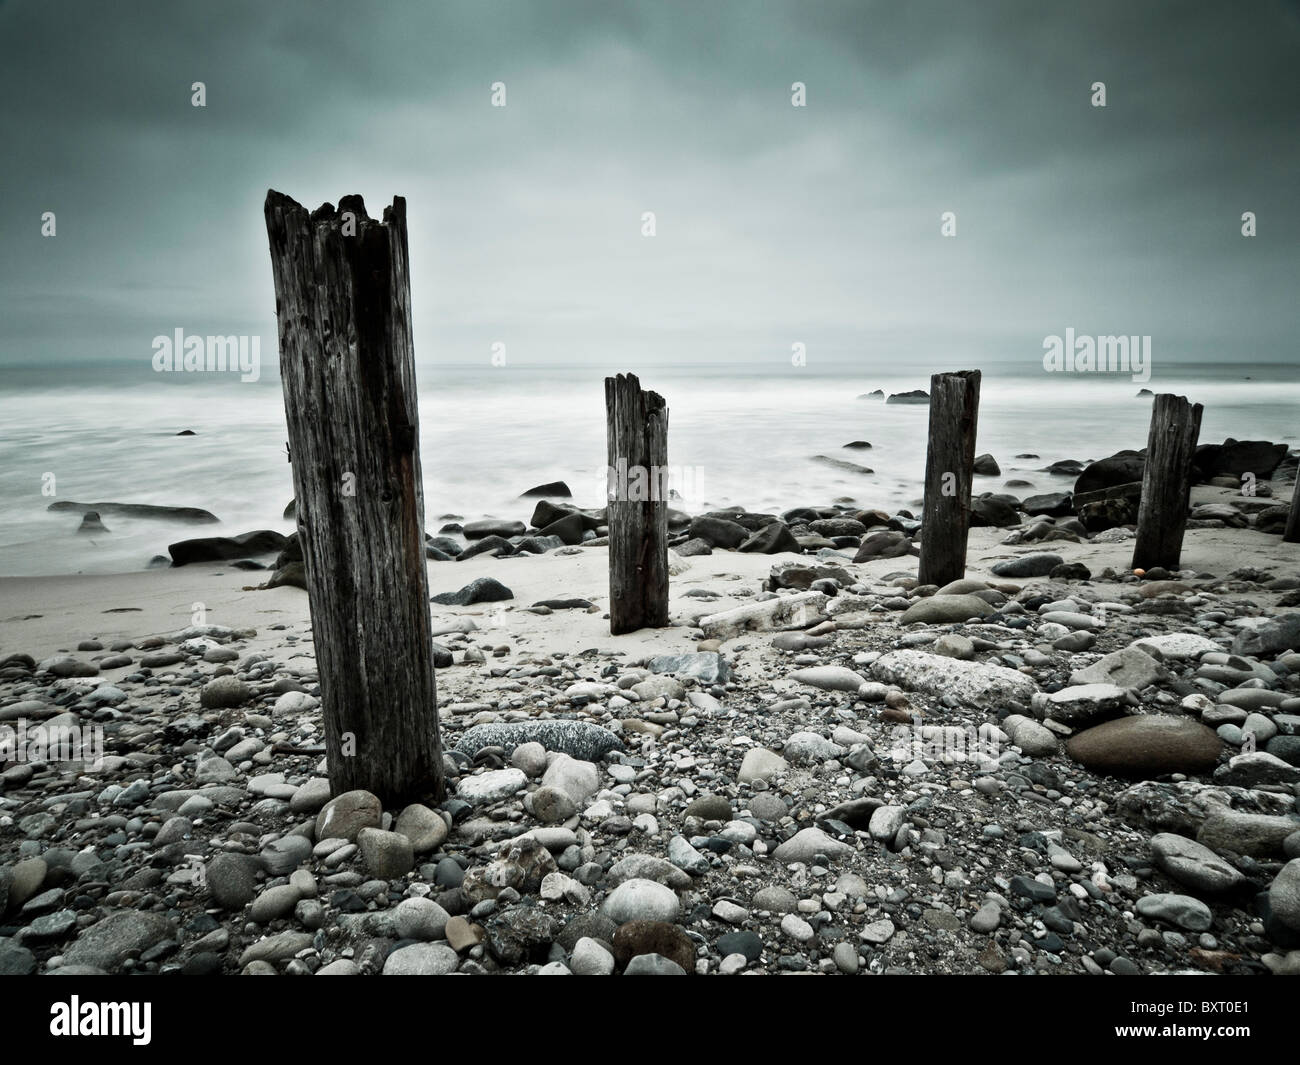 Cold dreary morning at Malibu beach. - Stock Image